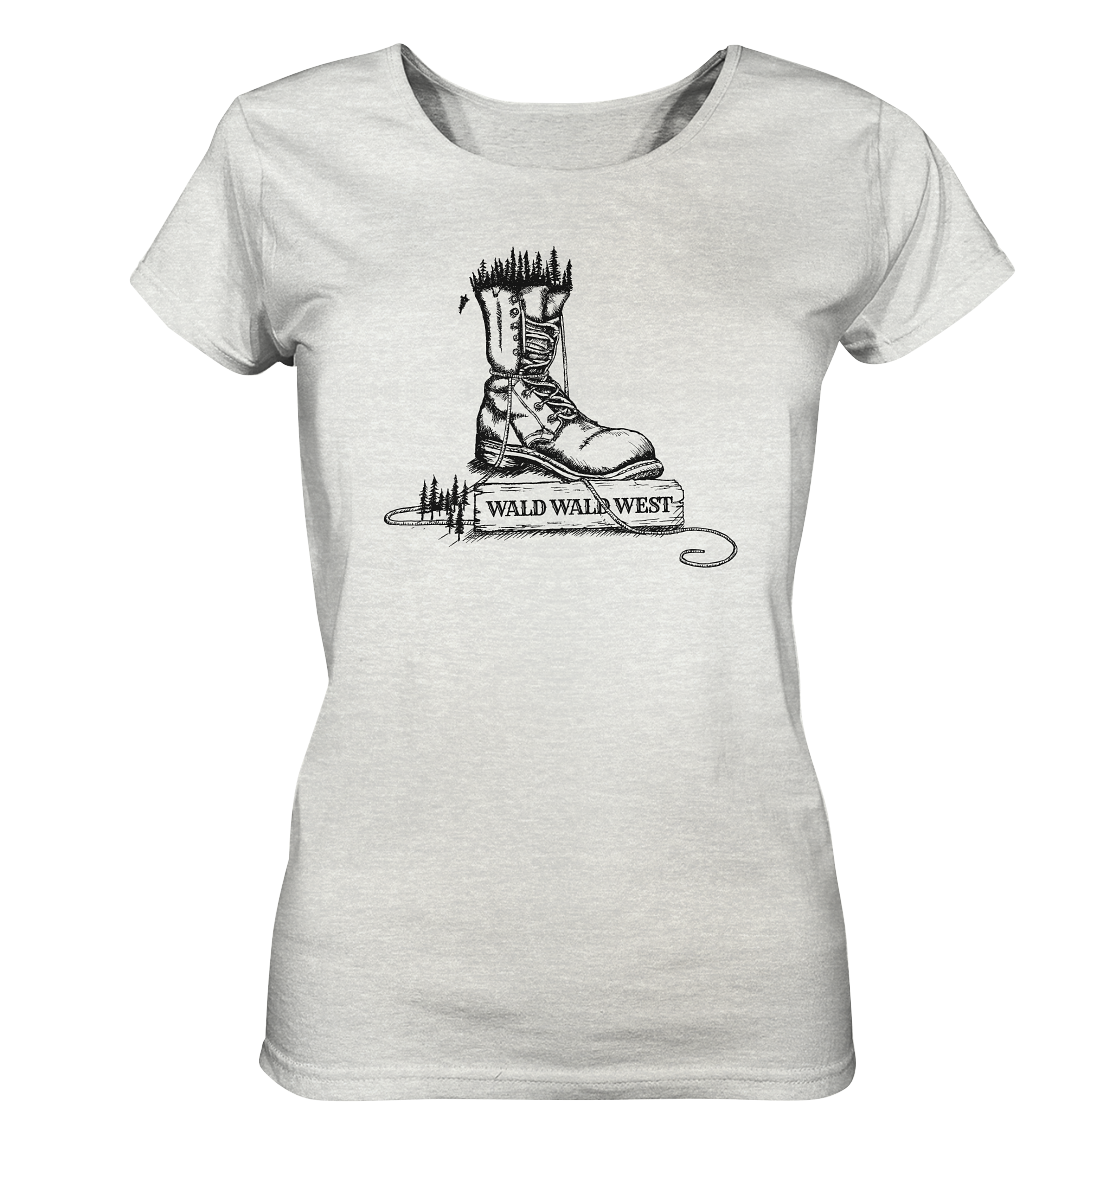 front-ladies-organic-shirt-meliert-f2f5f3-1116x-1.png